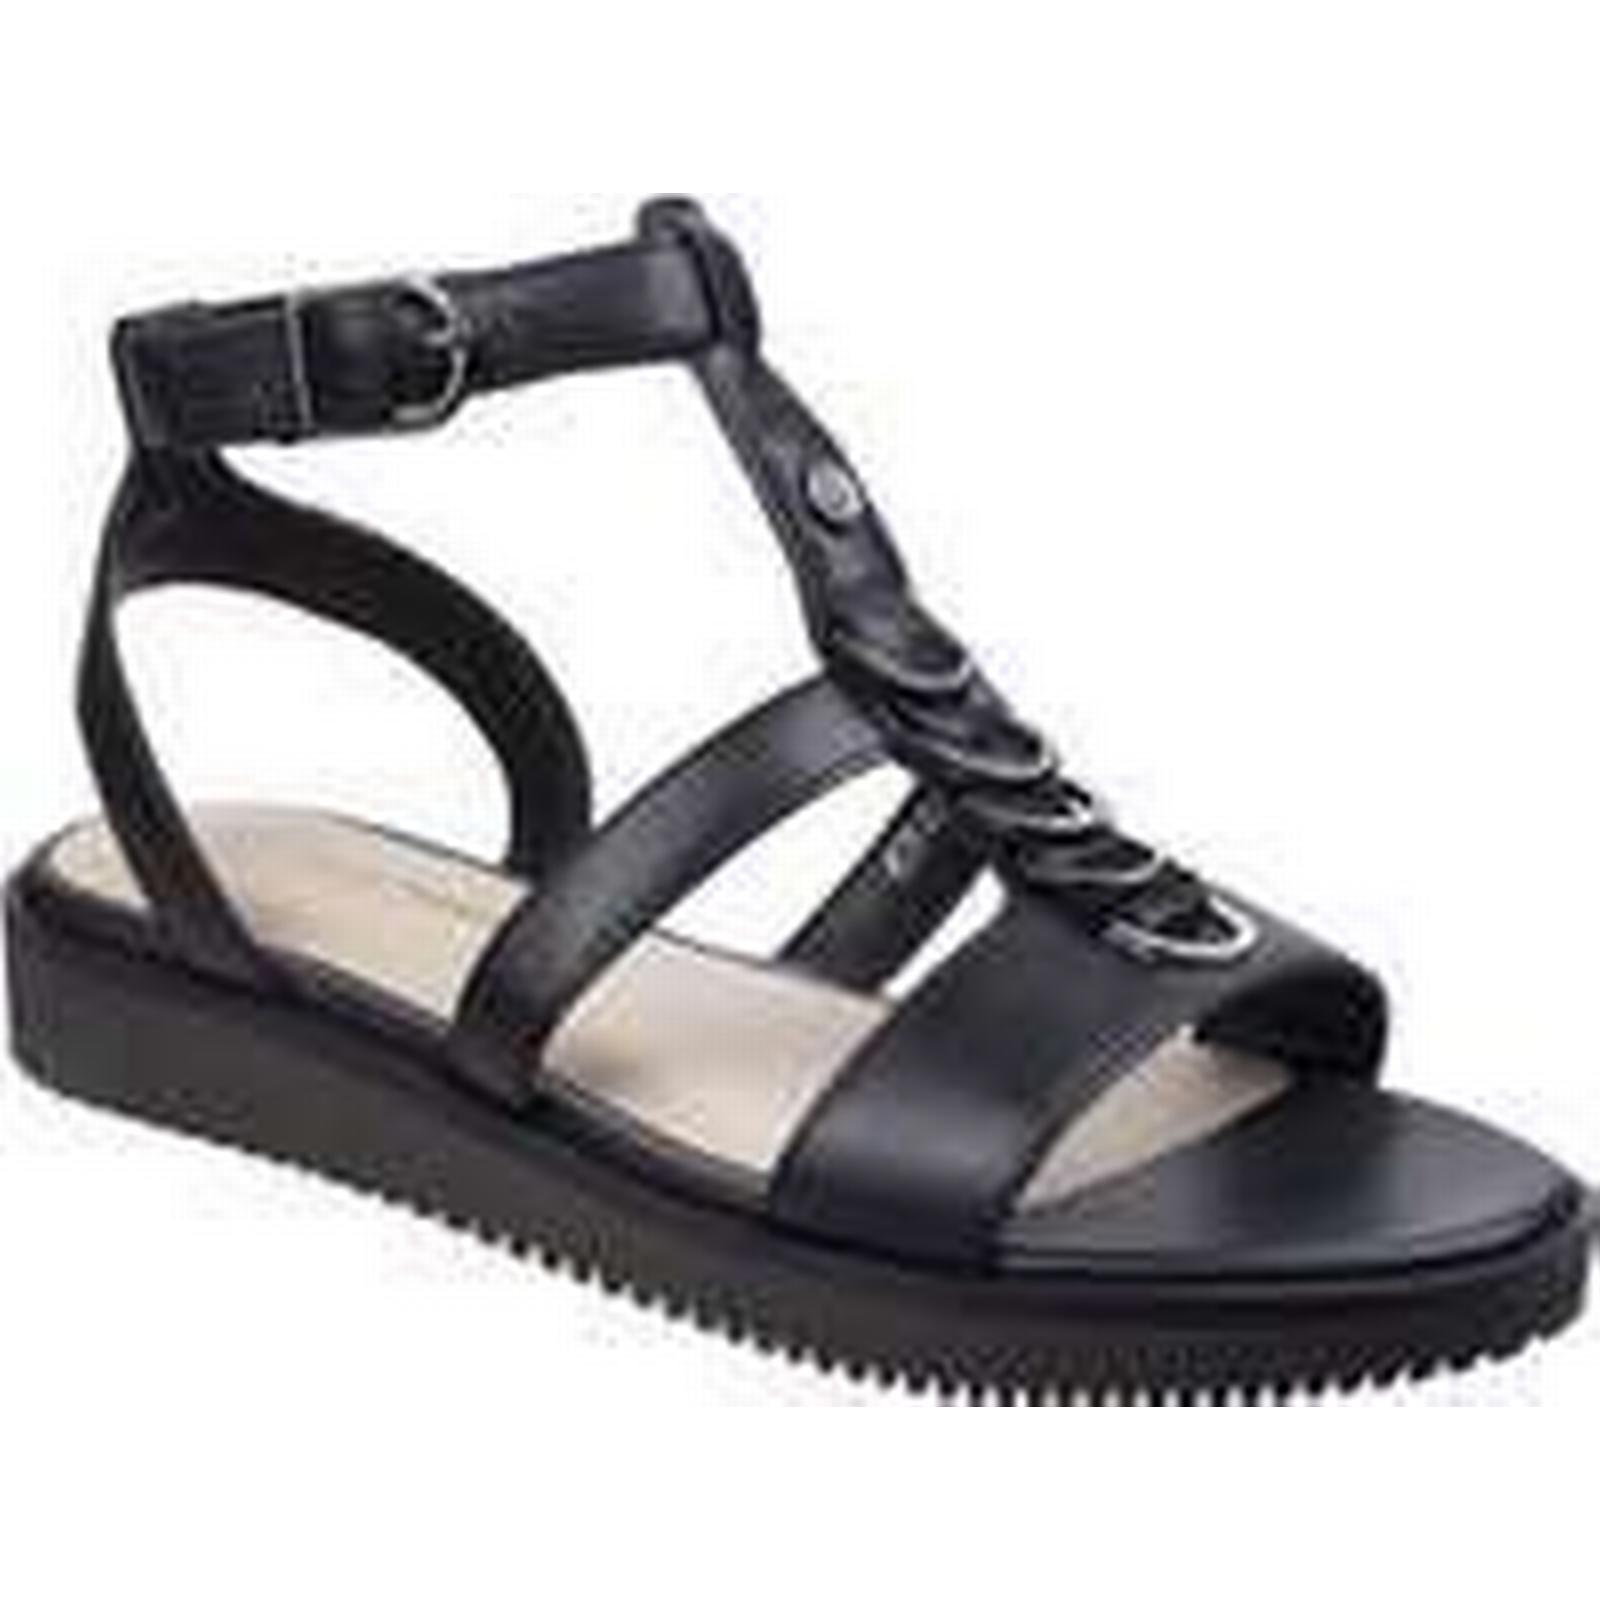 Spartoo.co.uk Hush puppies Sandals Briard Womens Ring T-Strap Sandal women's Sandals puppies in Black 918635